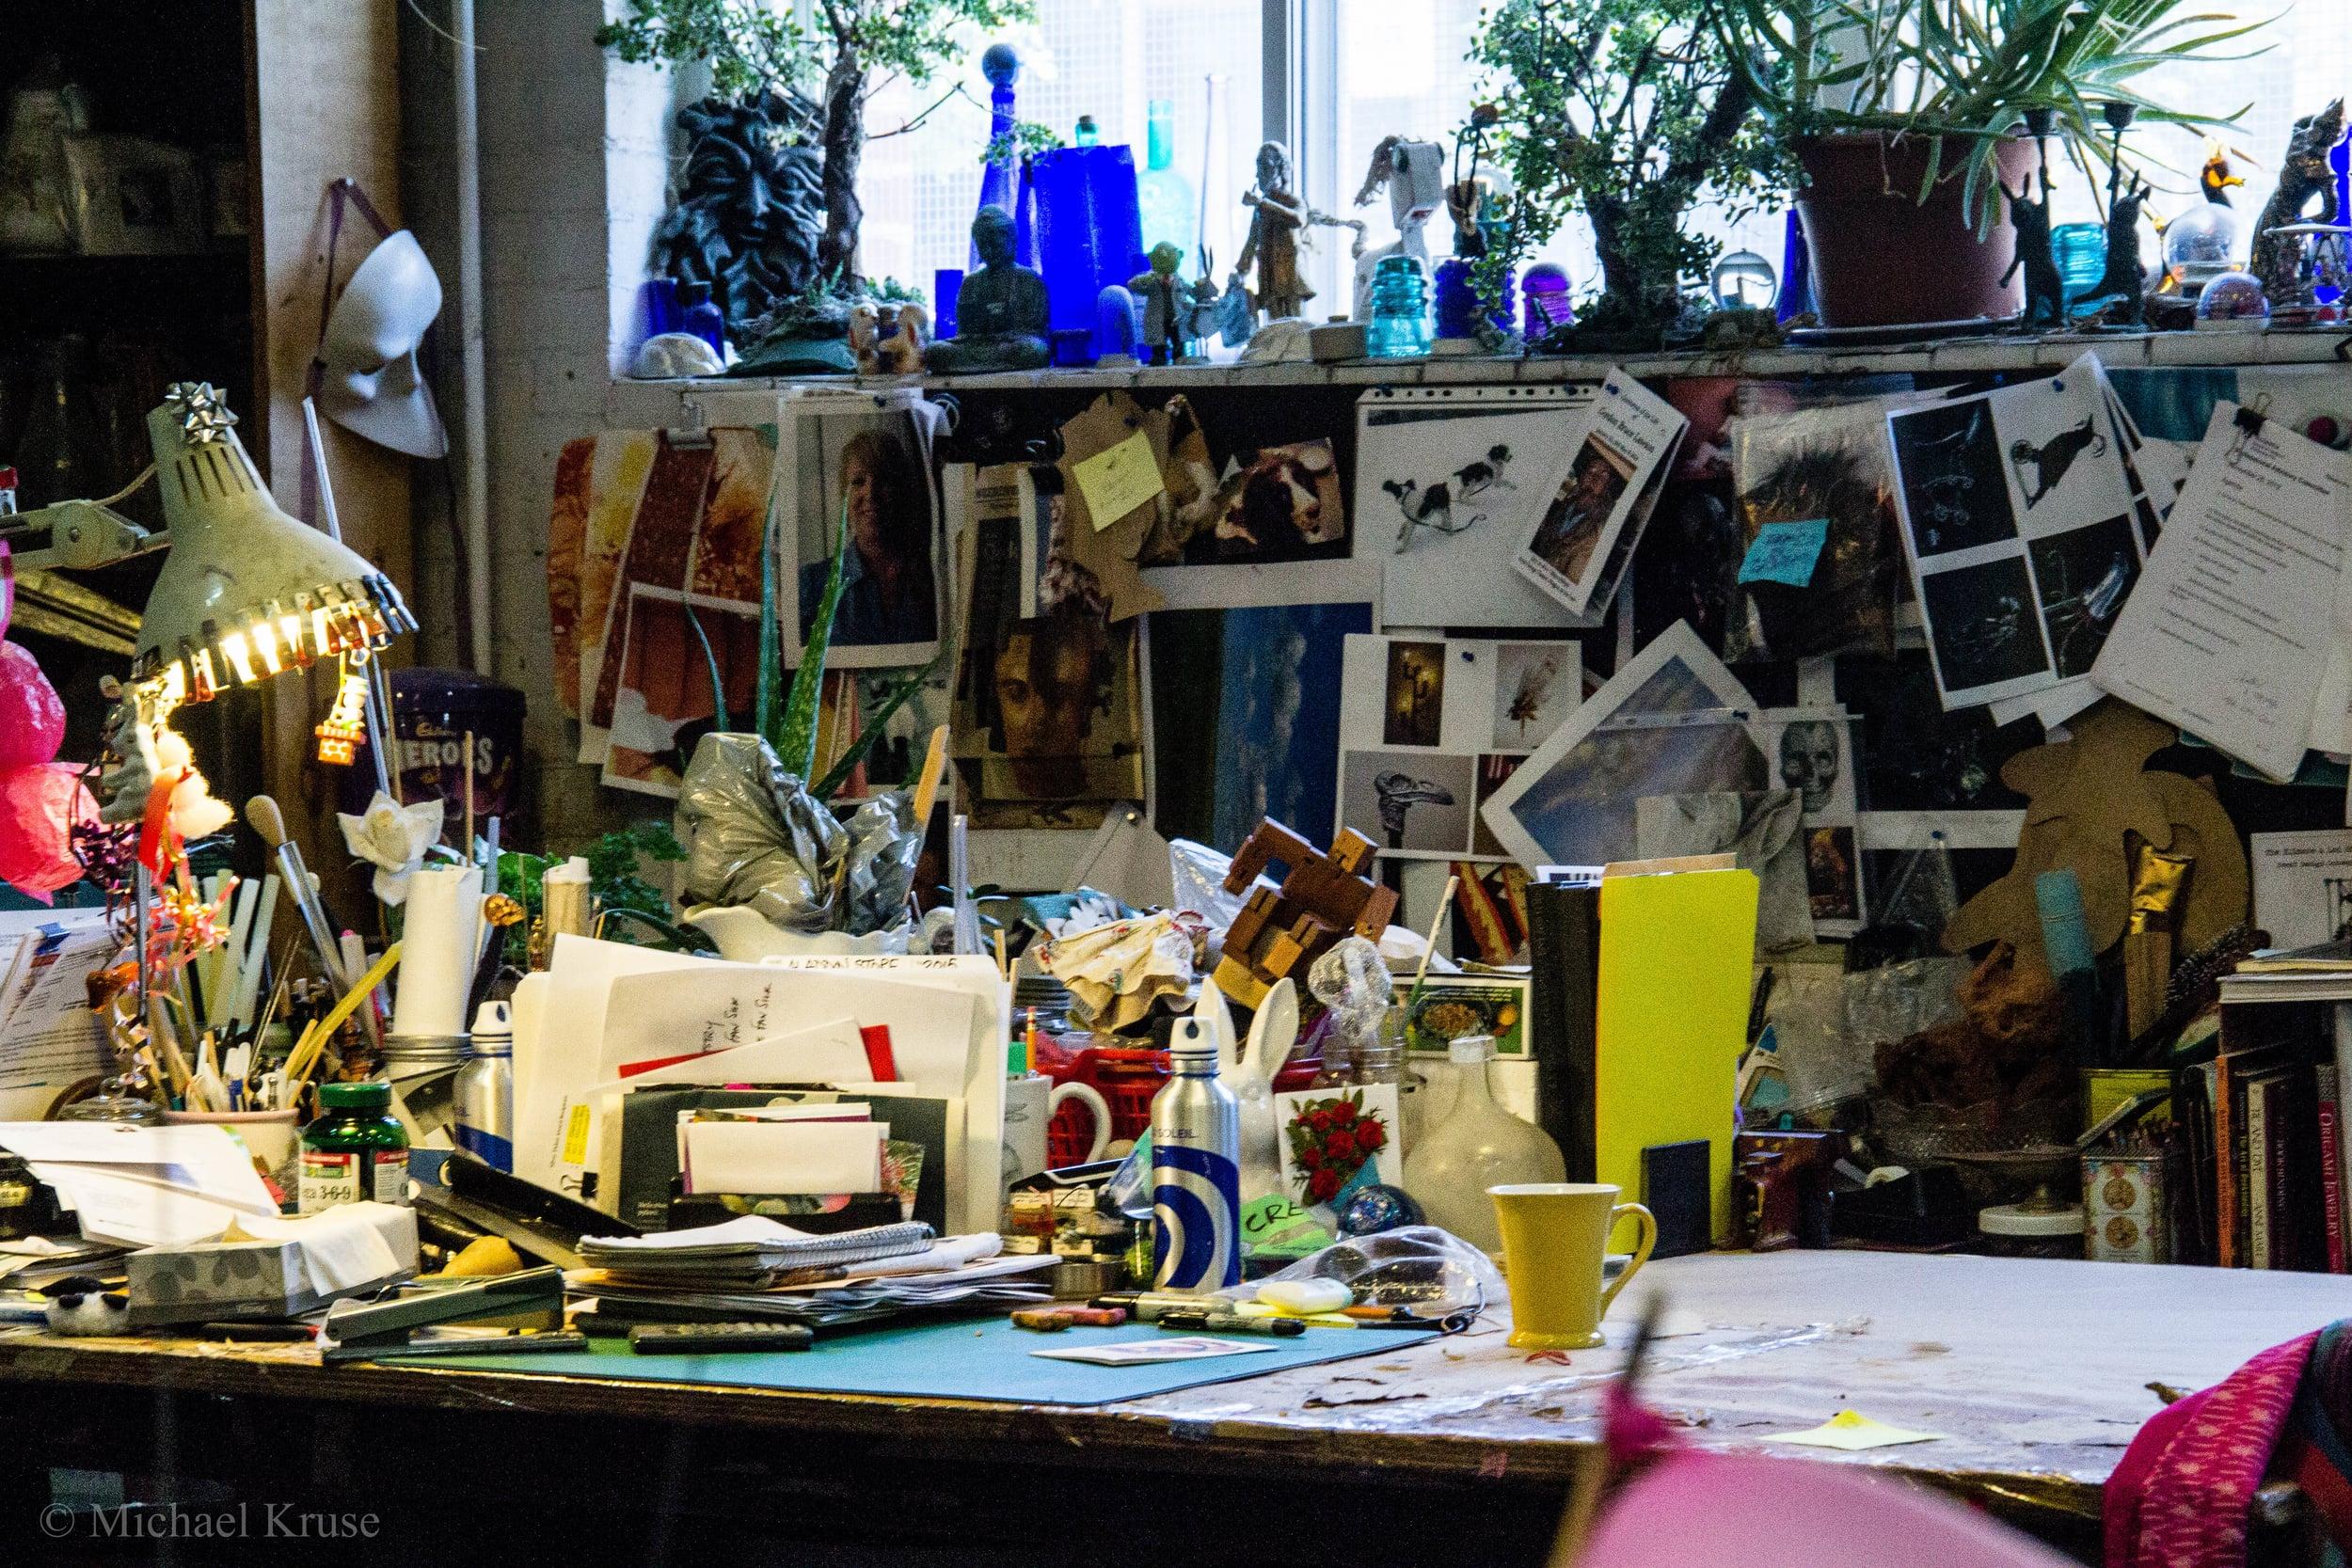 Fina's desk at The Rabbit's Choice